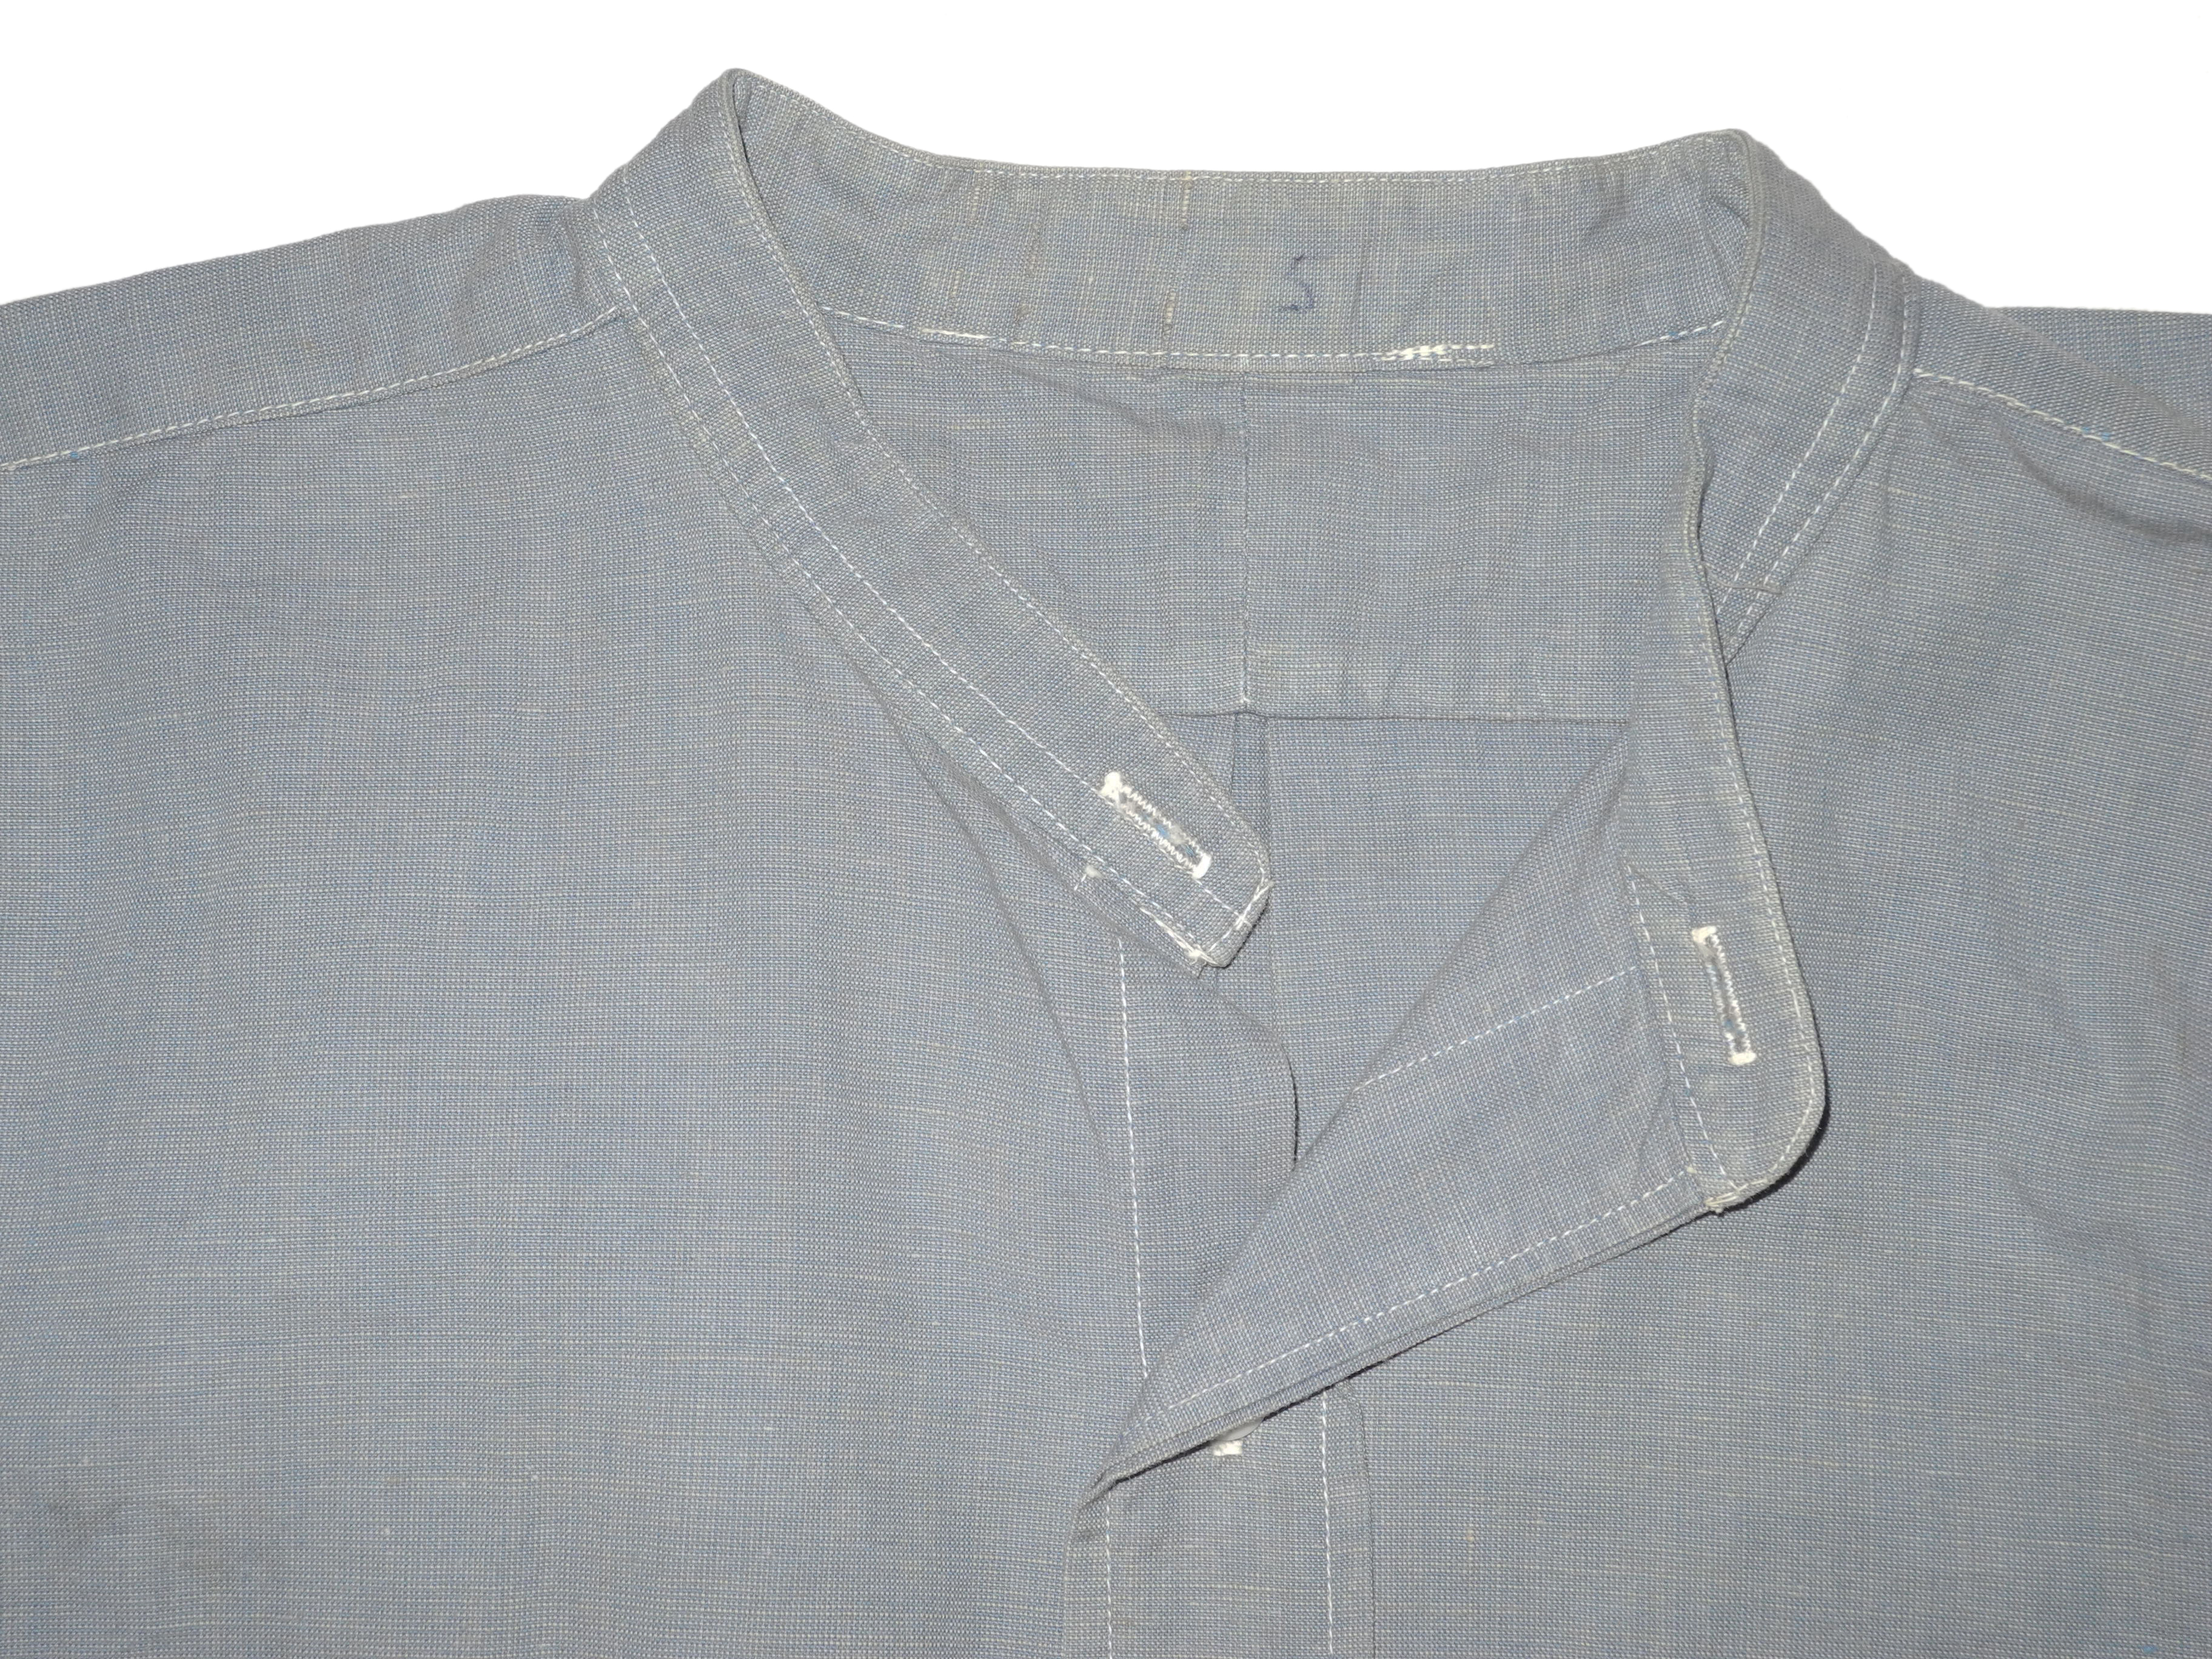 RAF other ranks uniform shirt